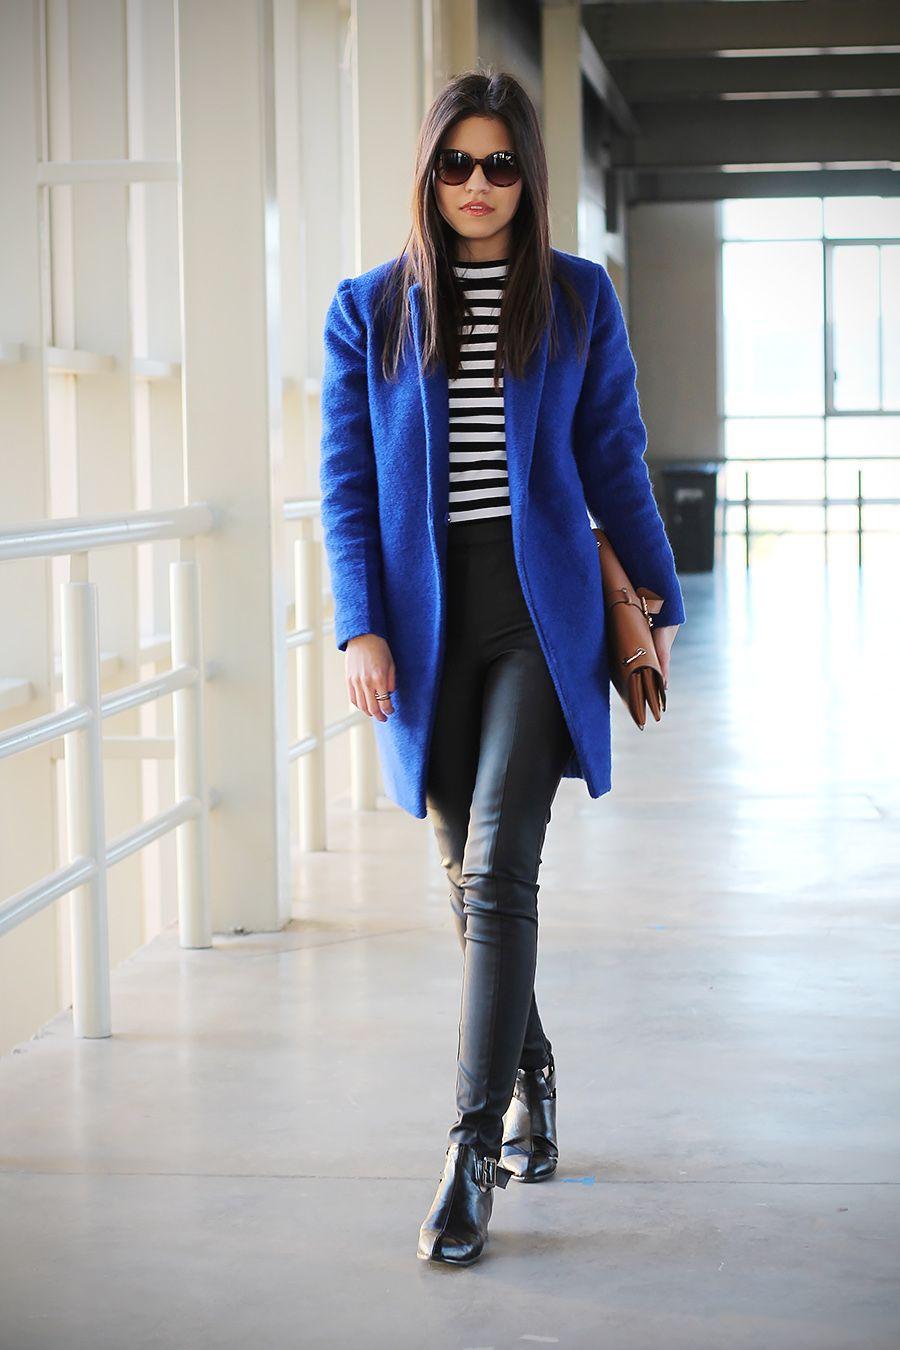 royal blue coat + leather pants + boots